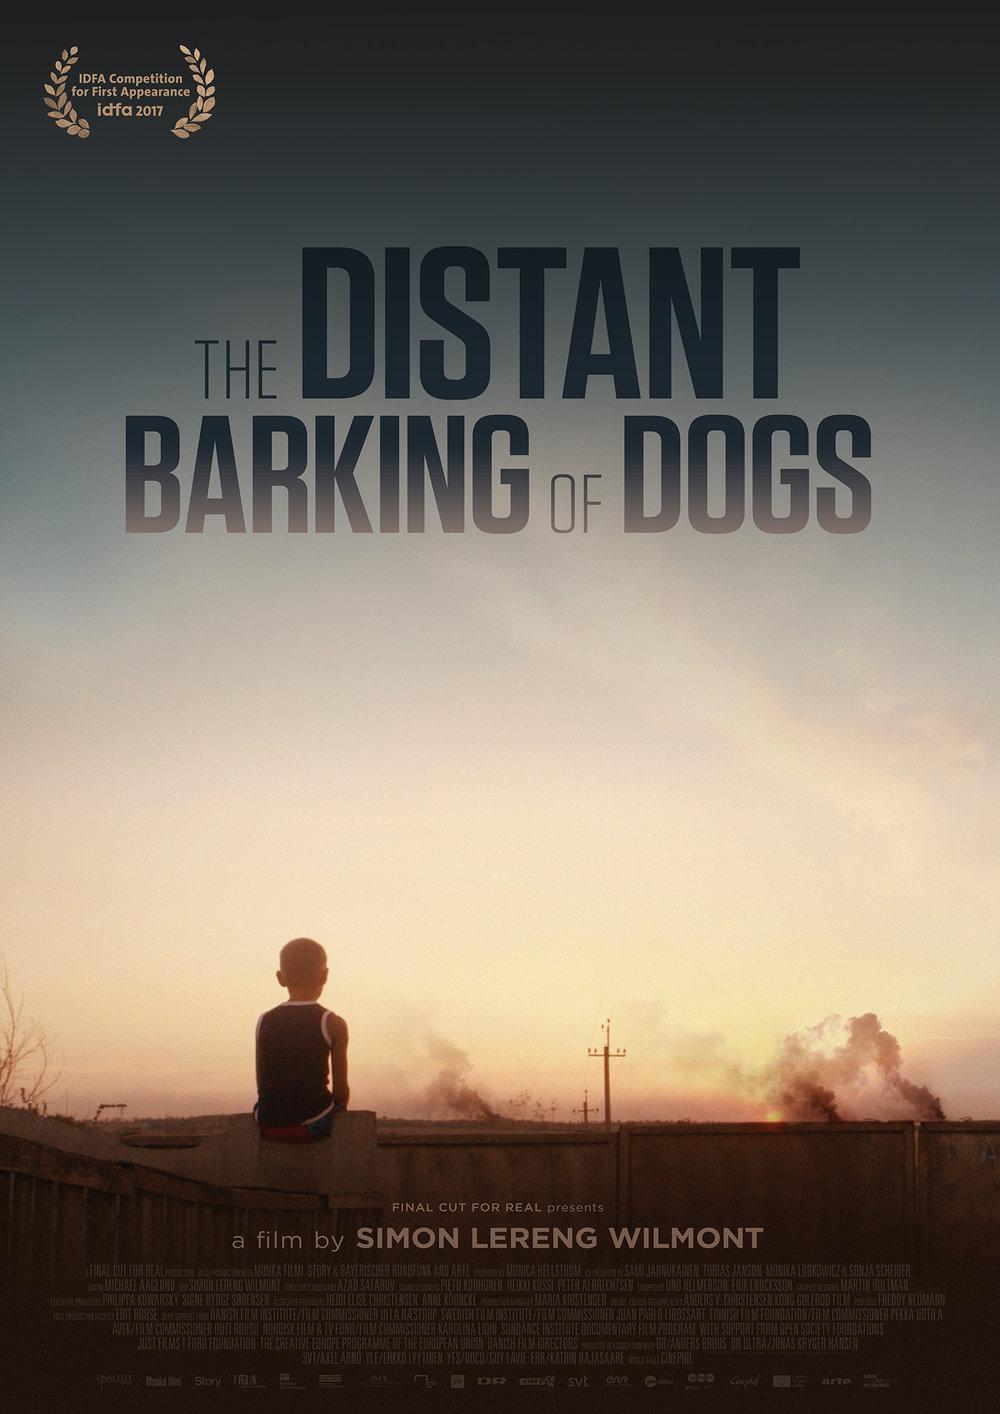 distant barking dog.jpg